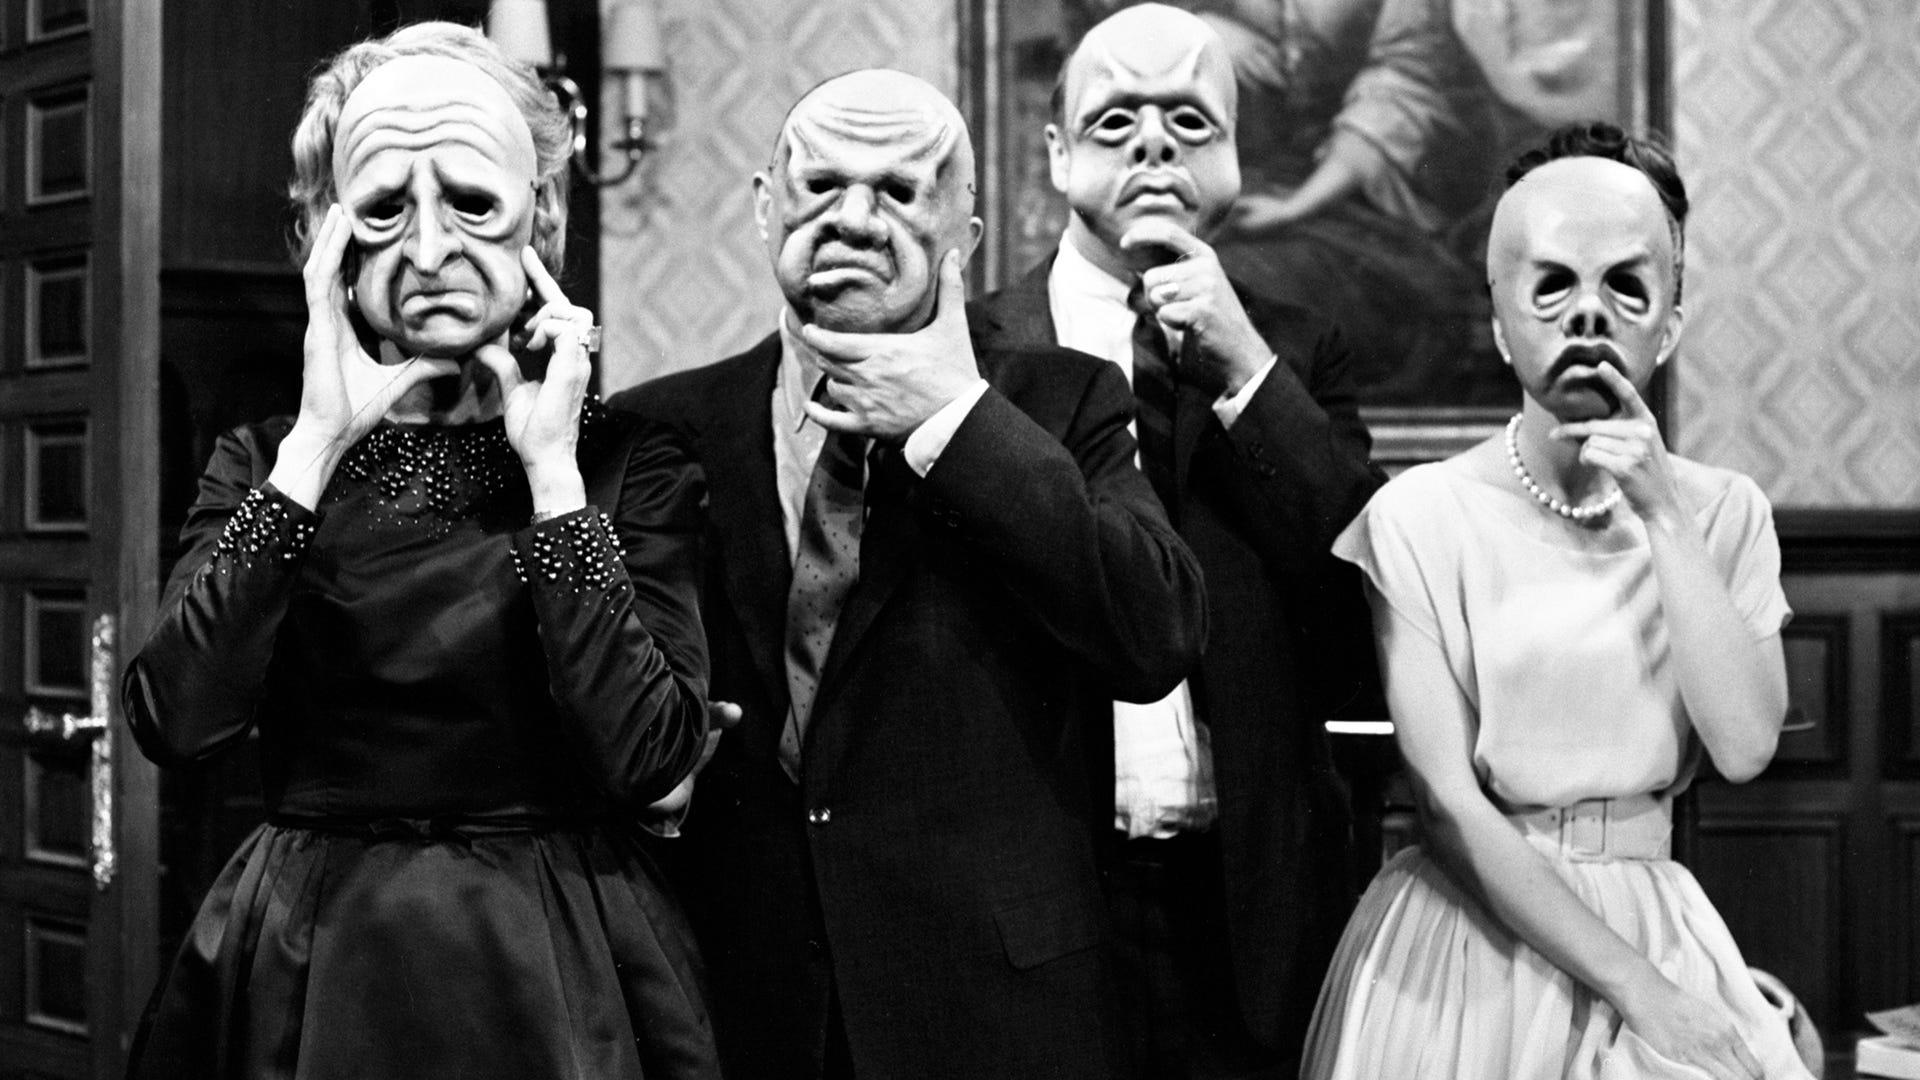 twilight-zone-masks-news.jpg